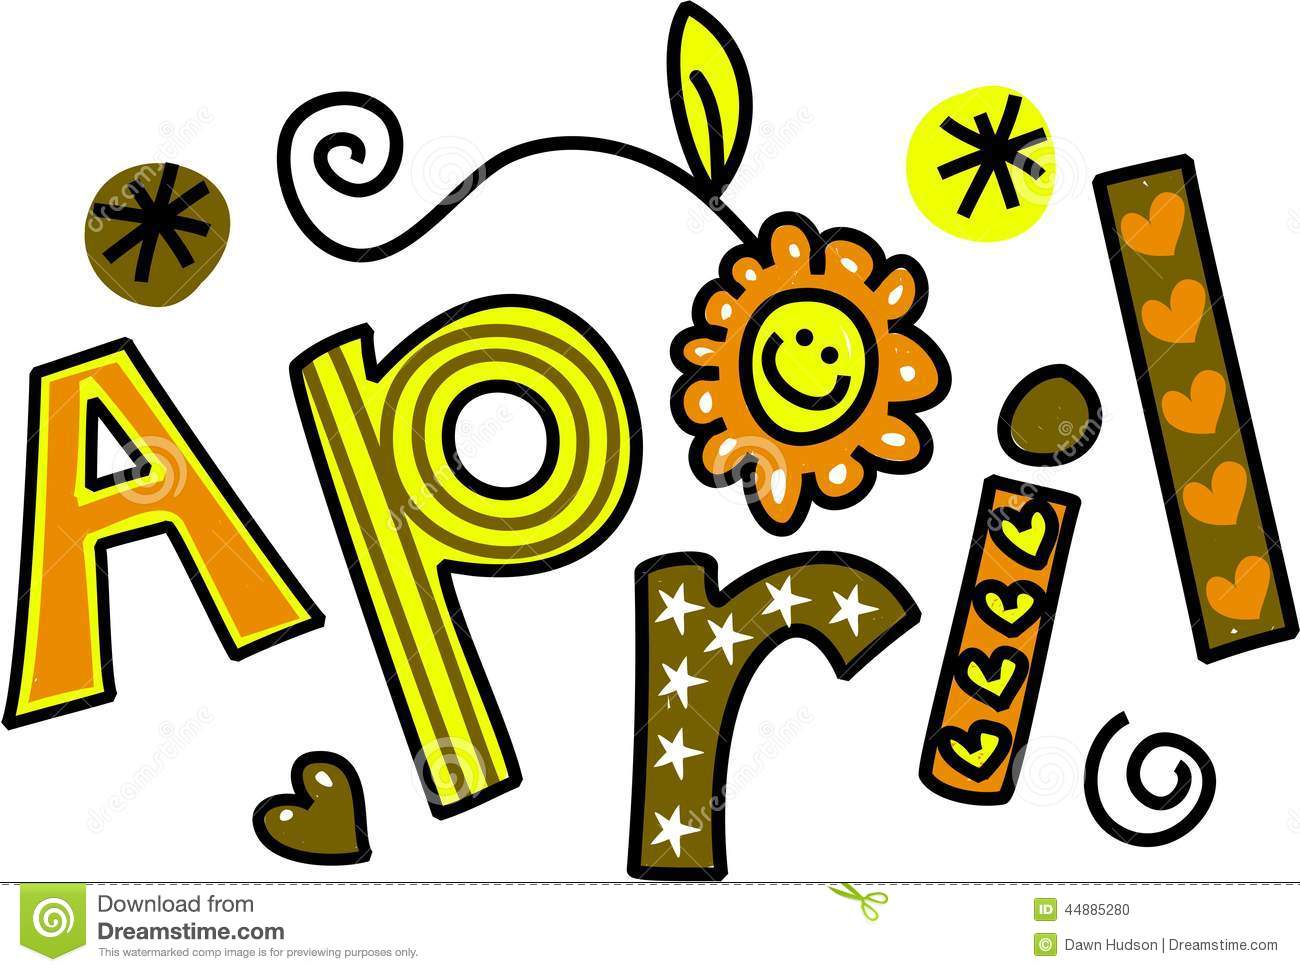 April happy. Free clipart download best